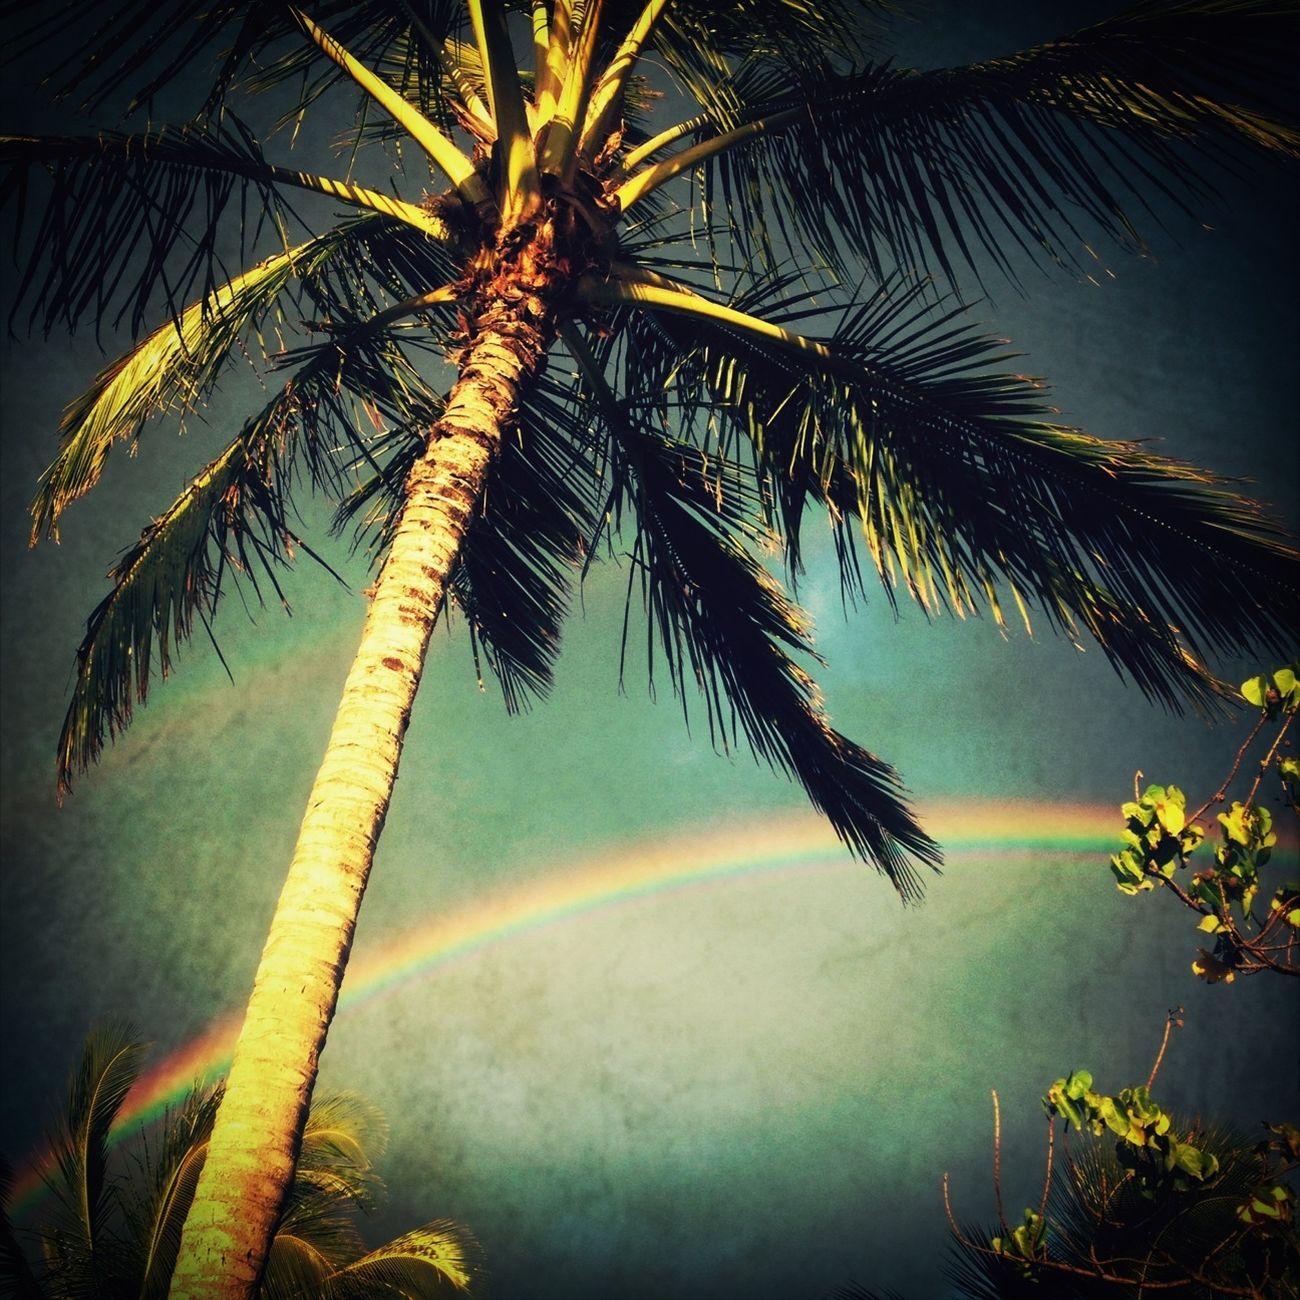 Rainbow Everyday Life WeatherPro: Your Perfect Weather Shot